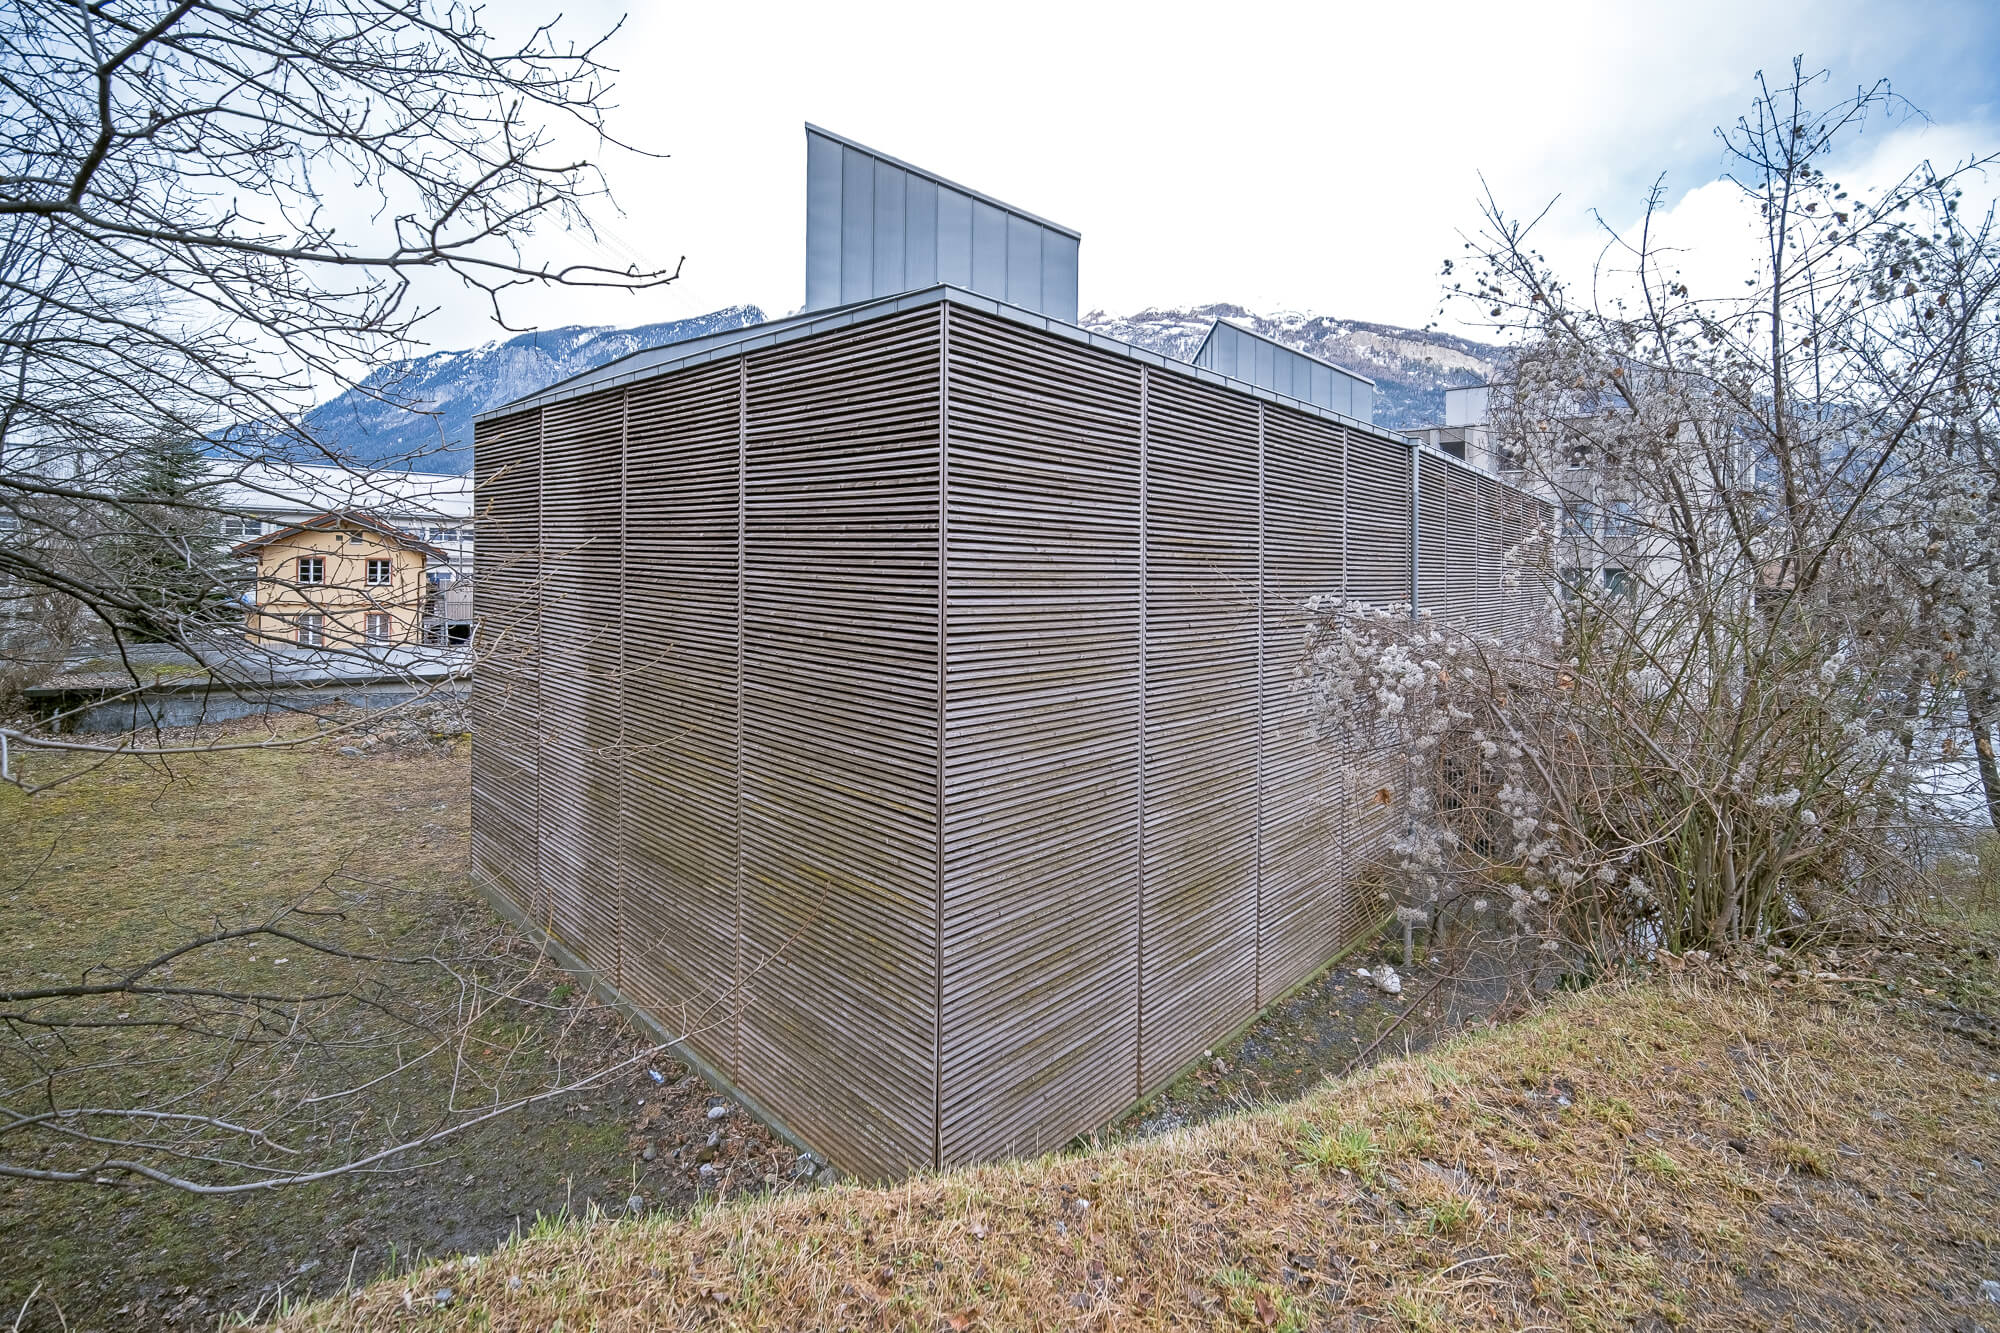 Zumthor Roman Archaeological Site in Chur, Switzerland